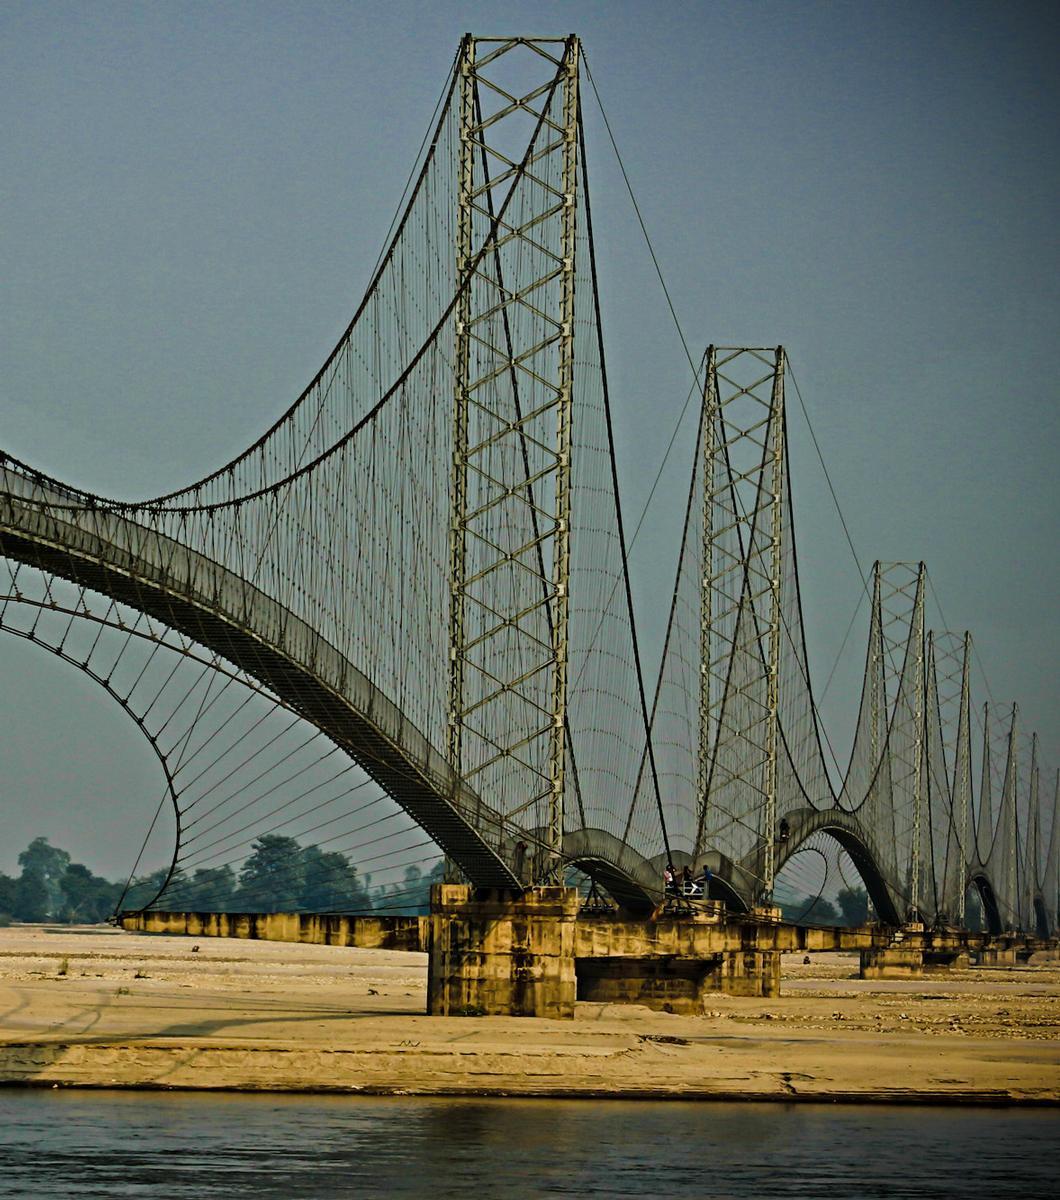 Dhodhara-Chandani Suspension Bridges